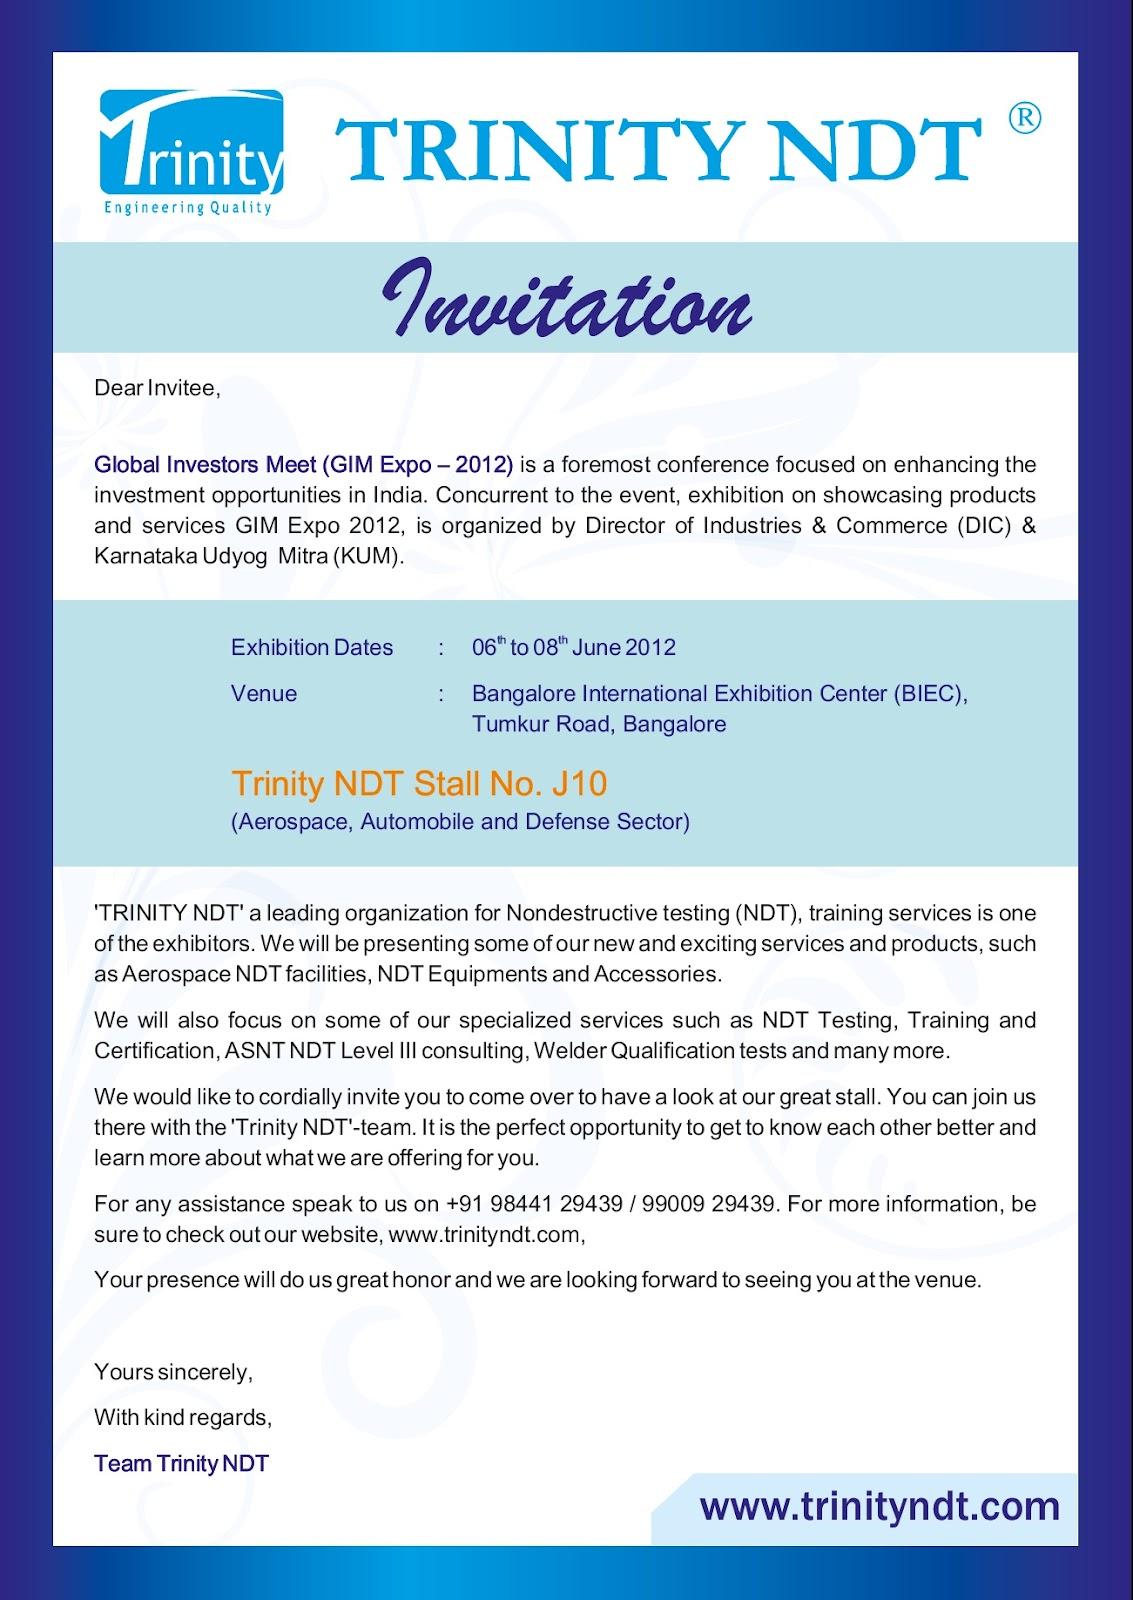 meet the candidate invitation sample party invitations ideas. Black Bedroom Furniture Sets. Home Design Ideas